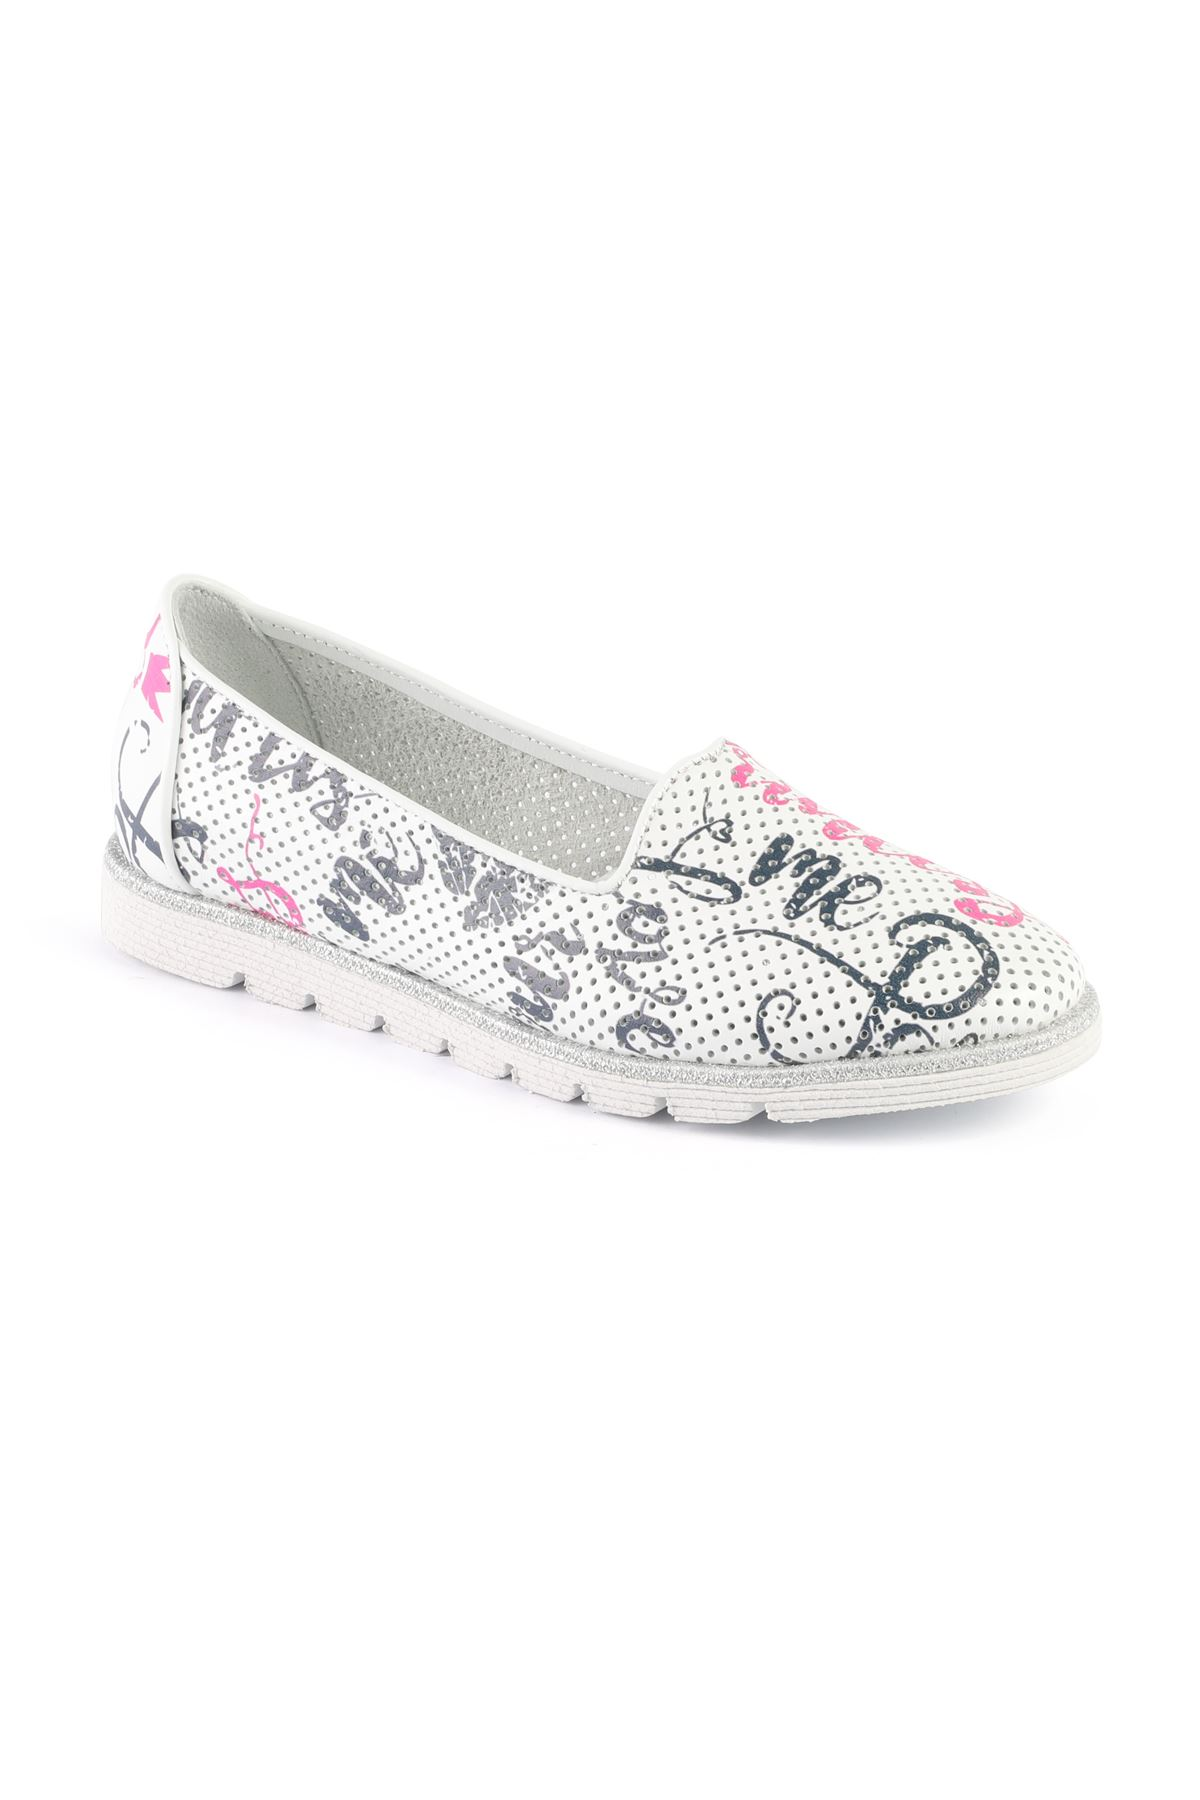 Libero MS2307 Beyaz Babet Ayakkabı